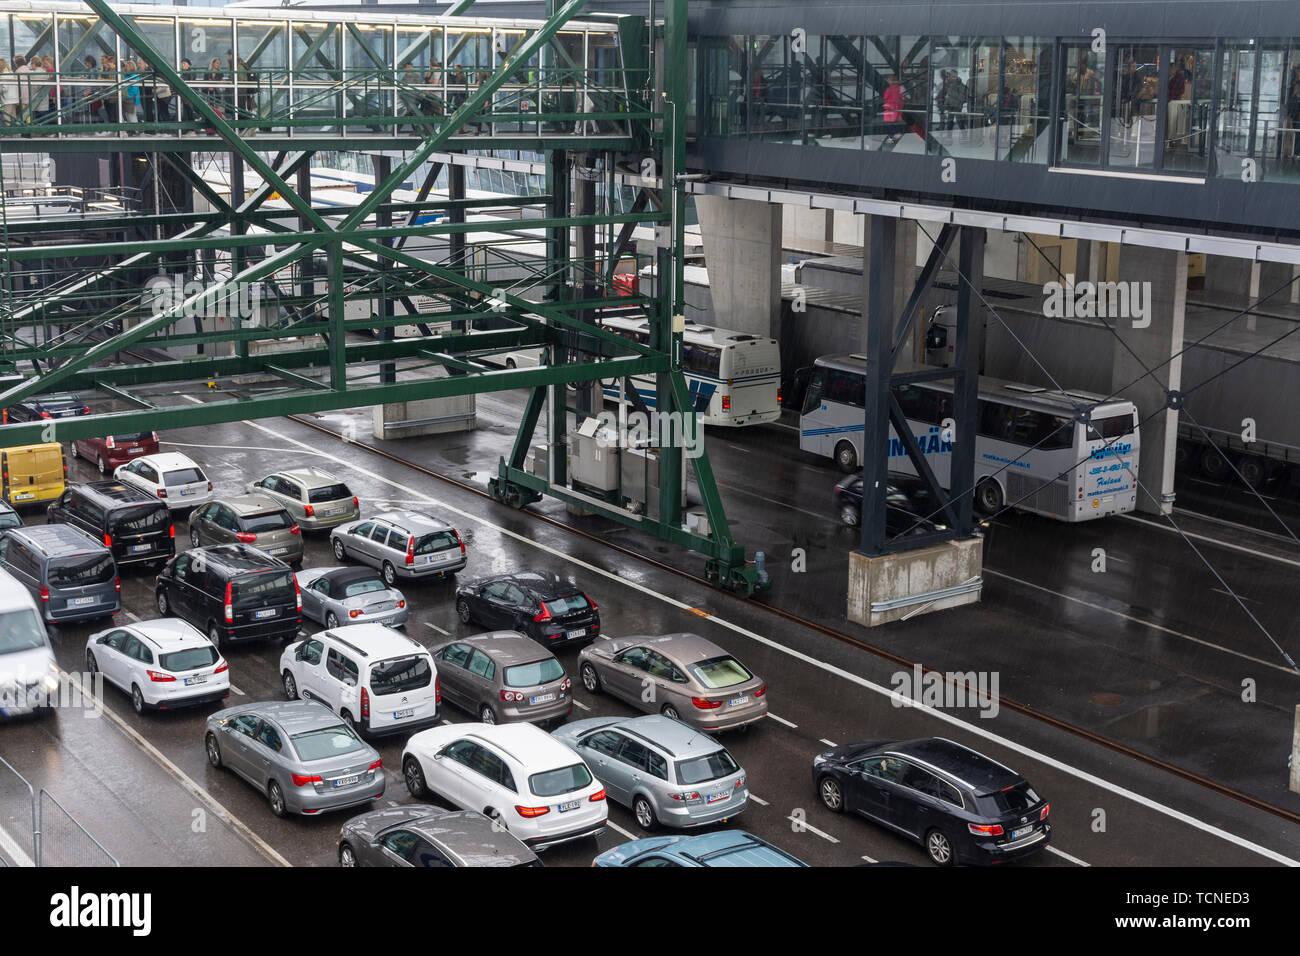 Cars driving into a ship to Helsinki from Tallinn Estonia Stock Photo